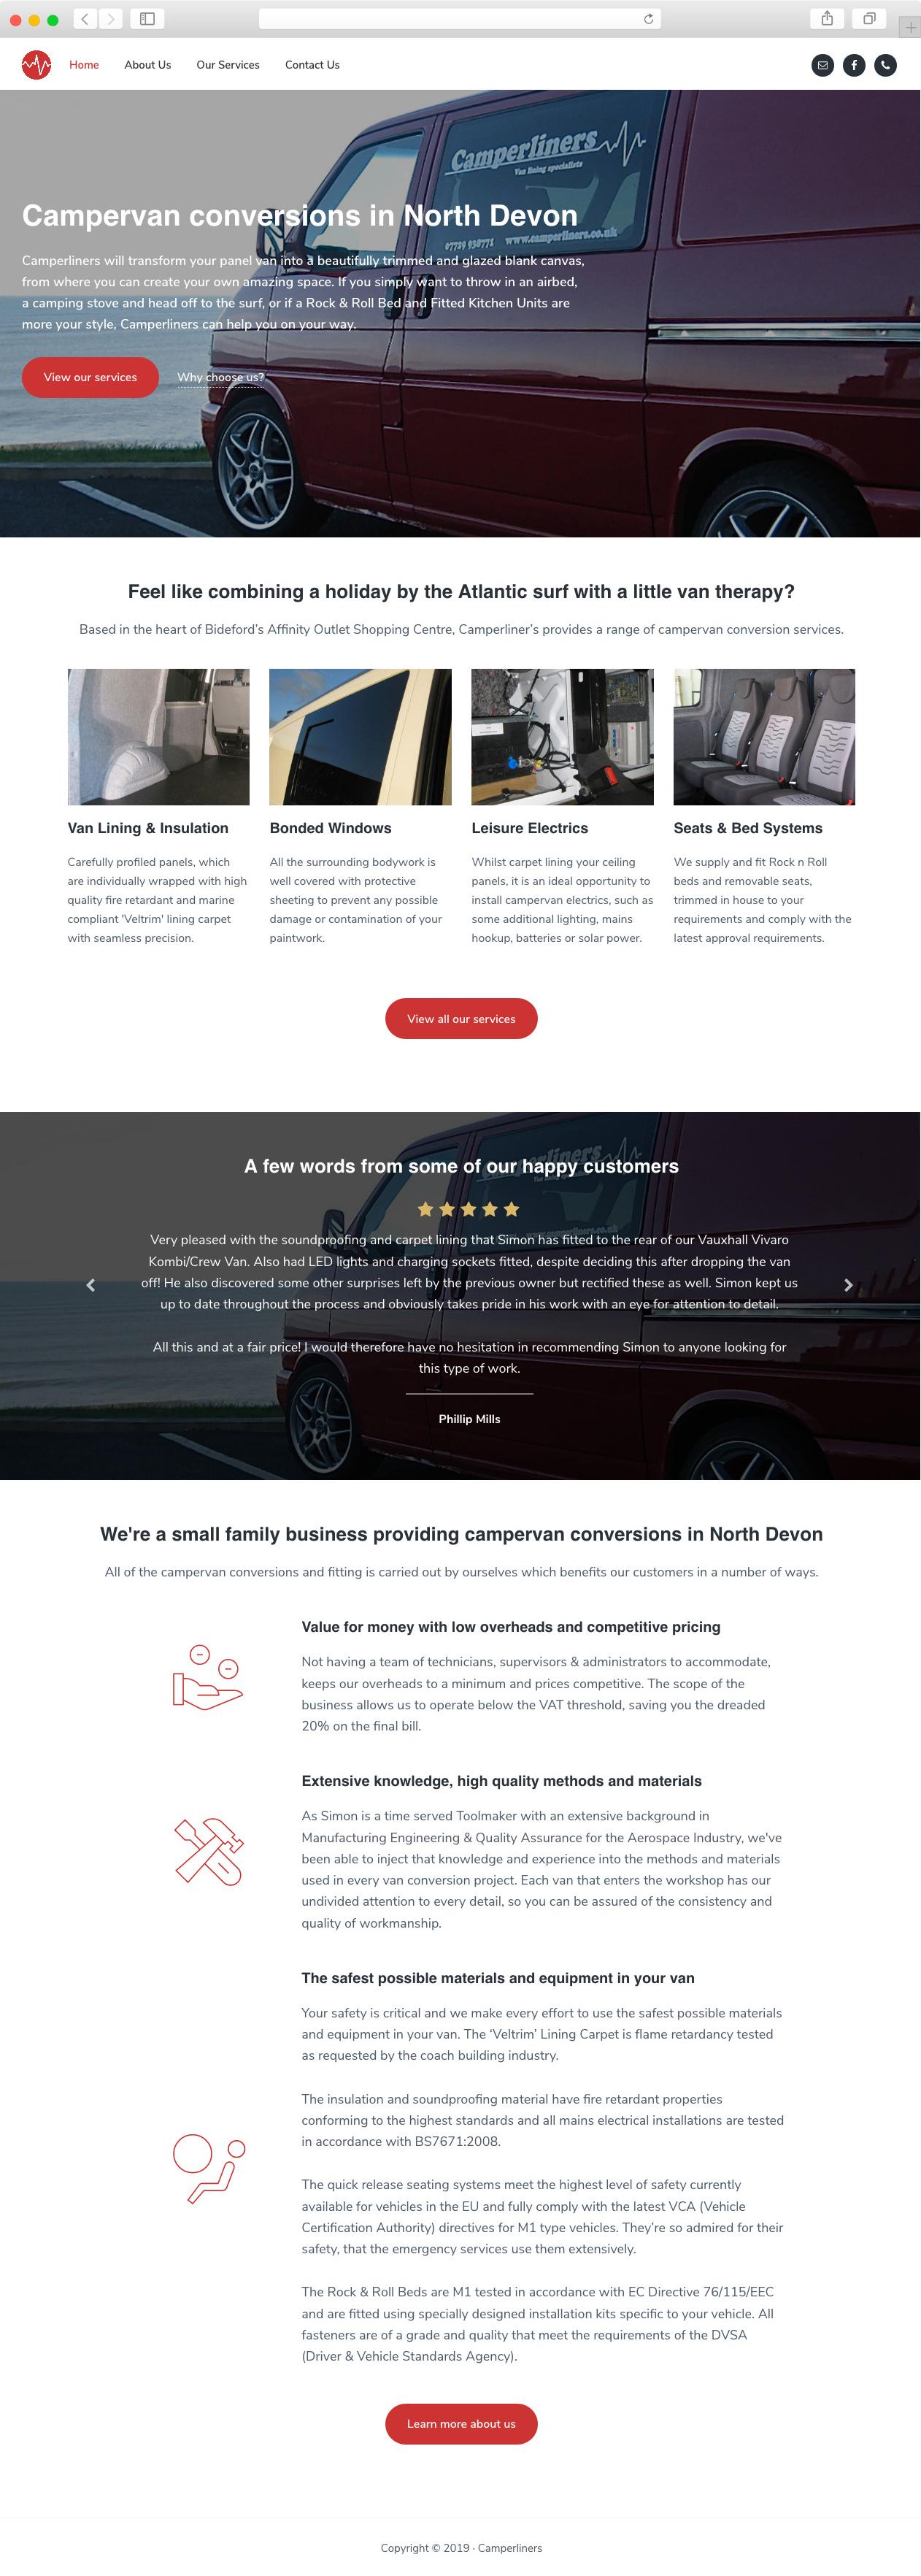 Camperliners website home page